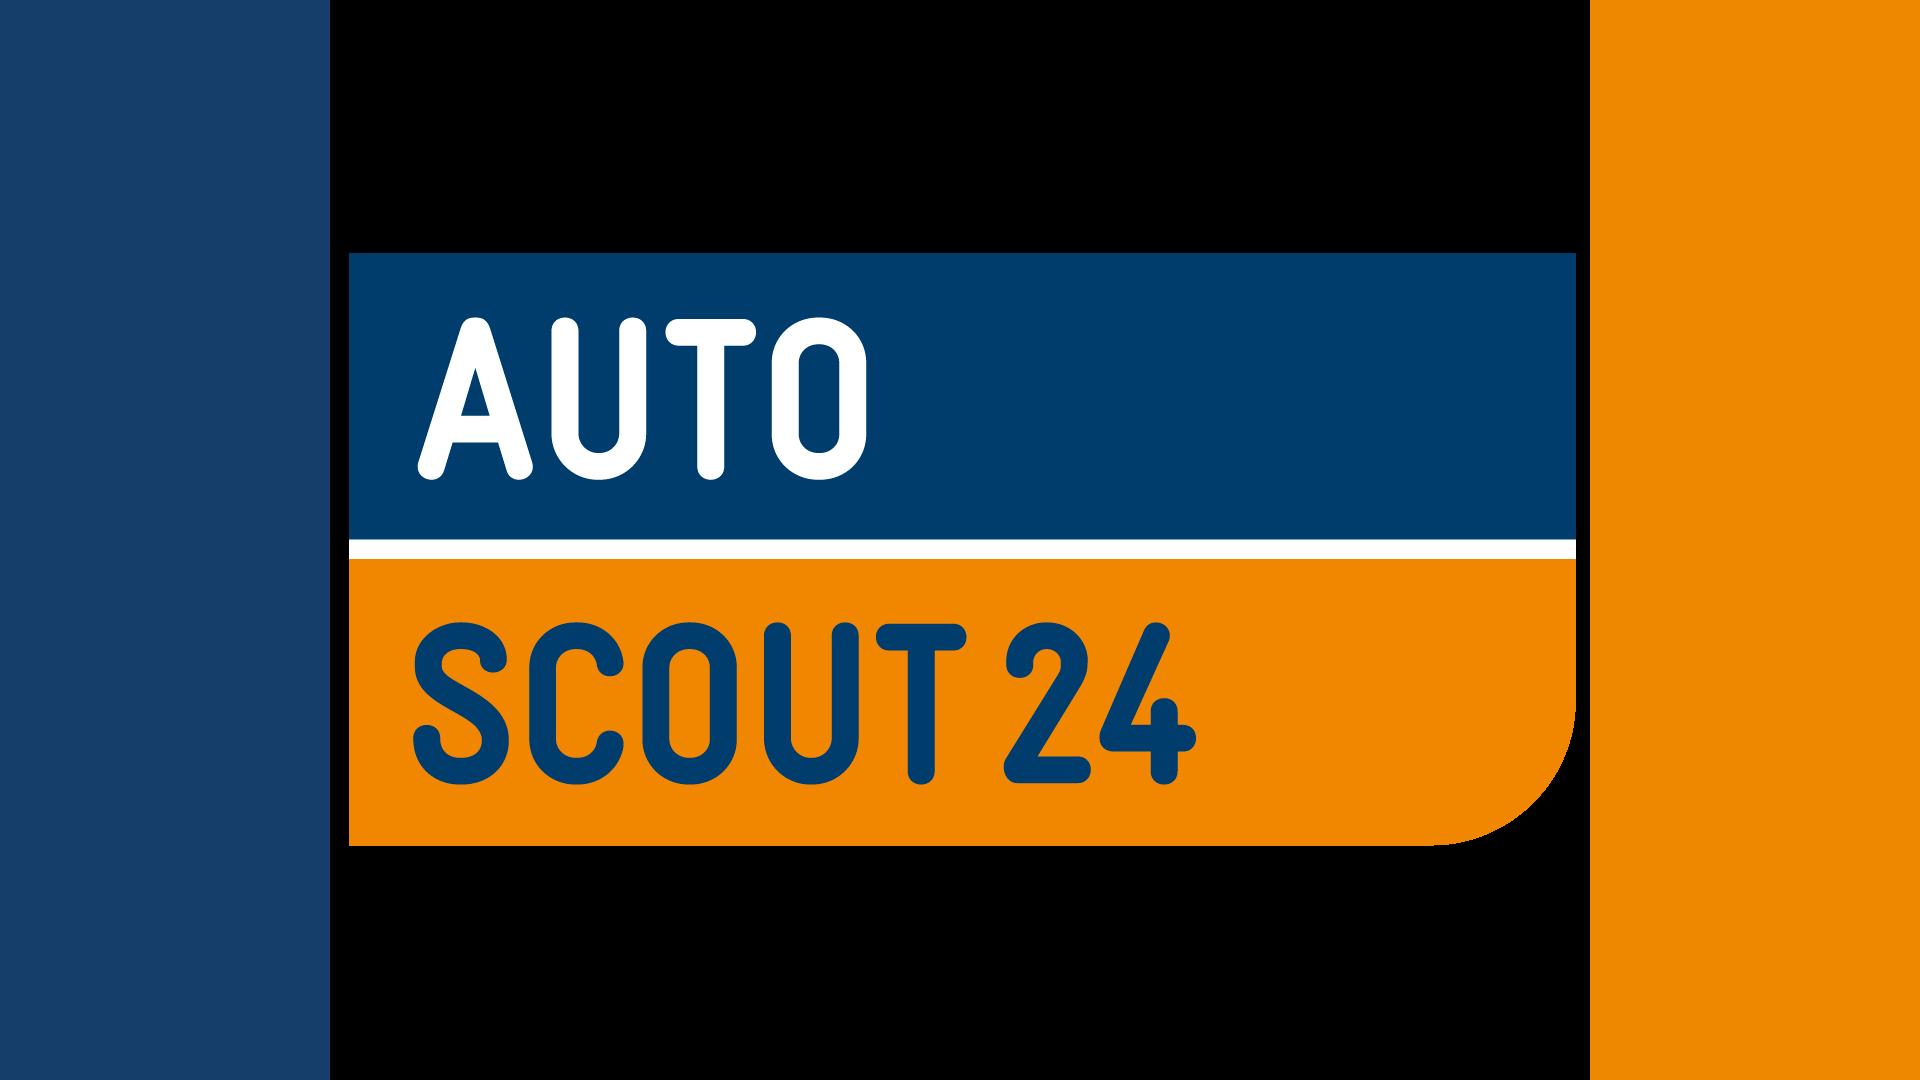 Auto Scout 24 Autopercopo